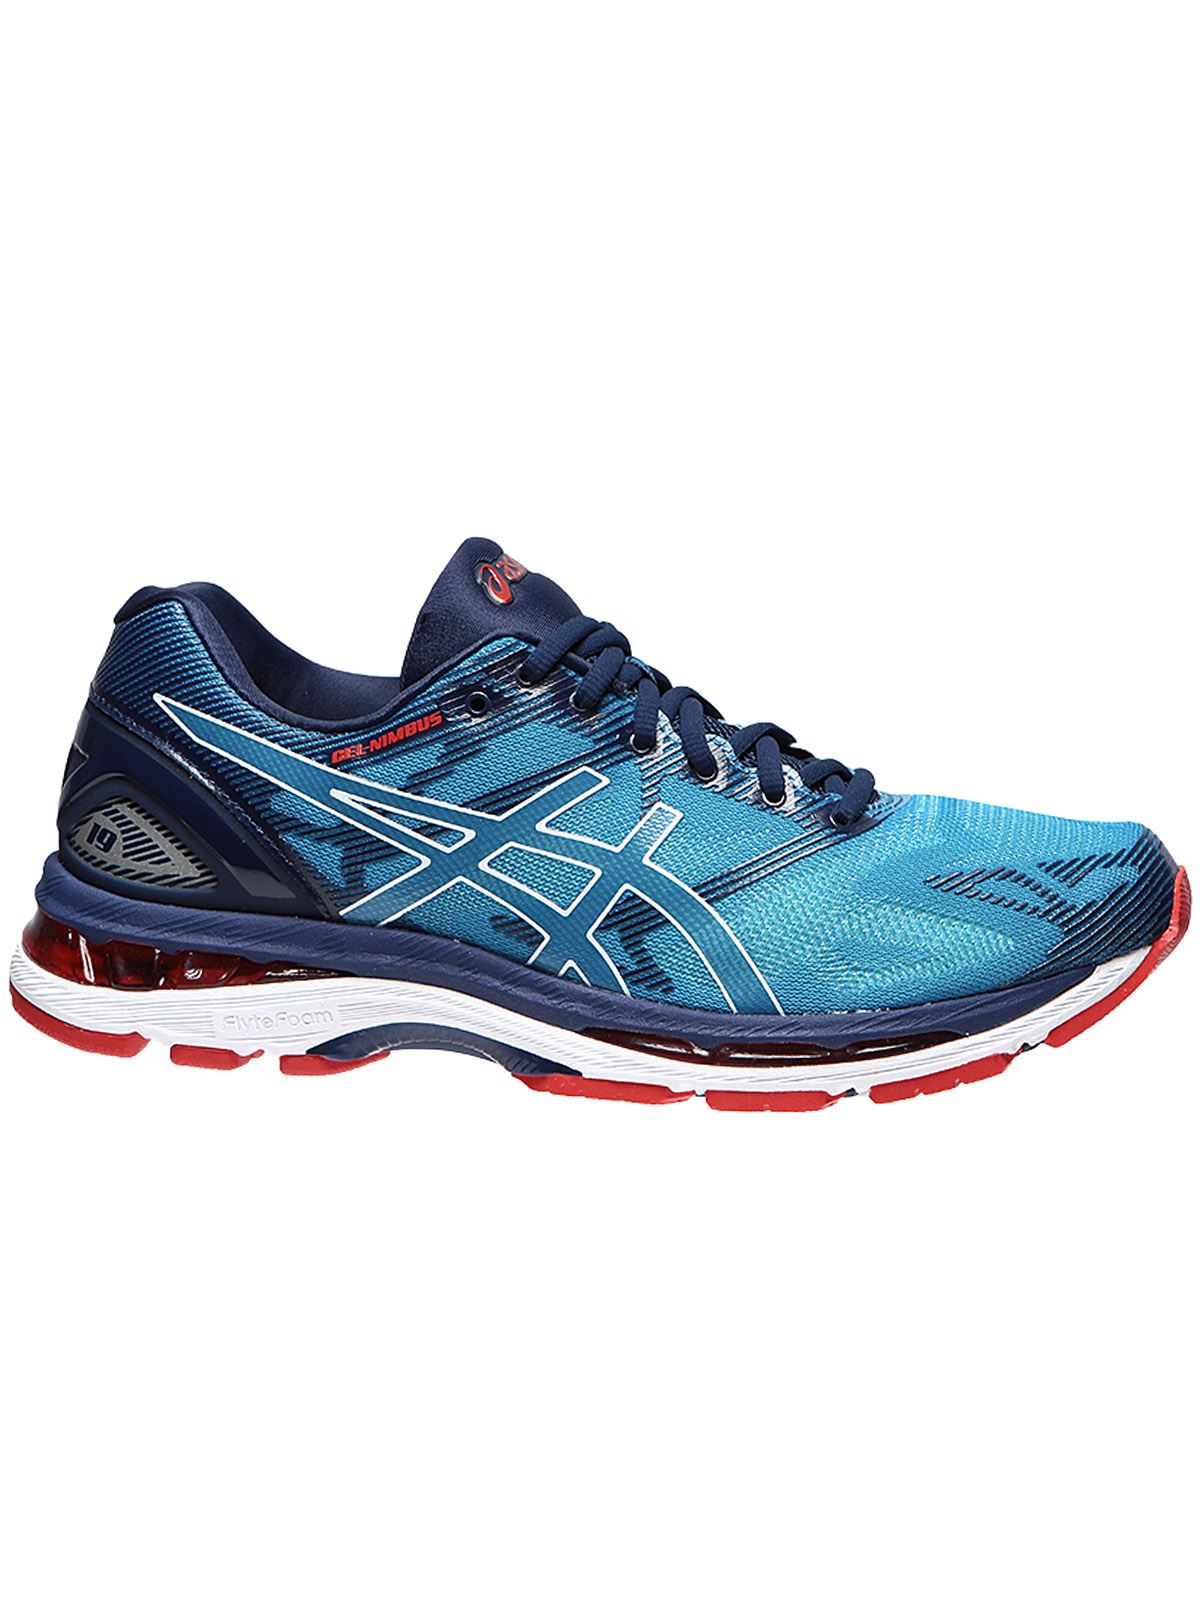 ASICS GEL NIMBUS 19 scarpa running Uomo ST700N 4301